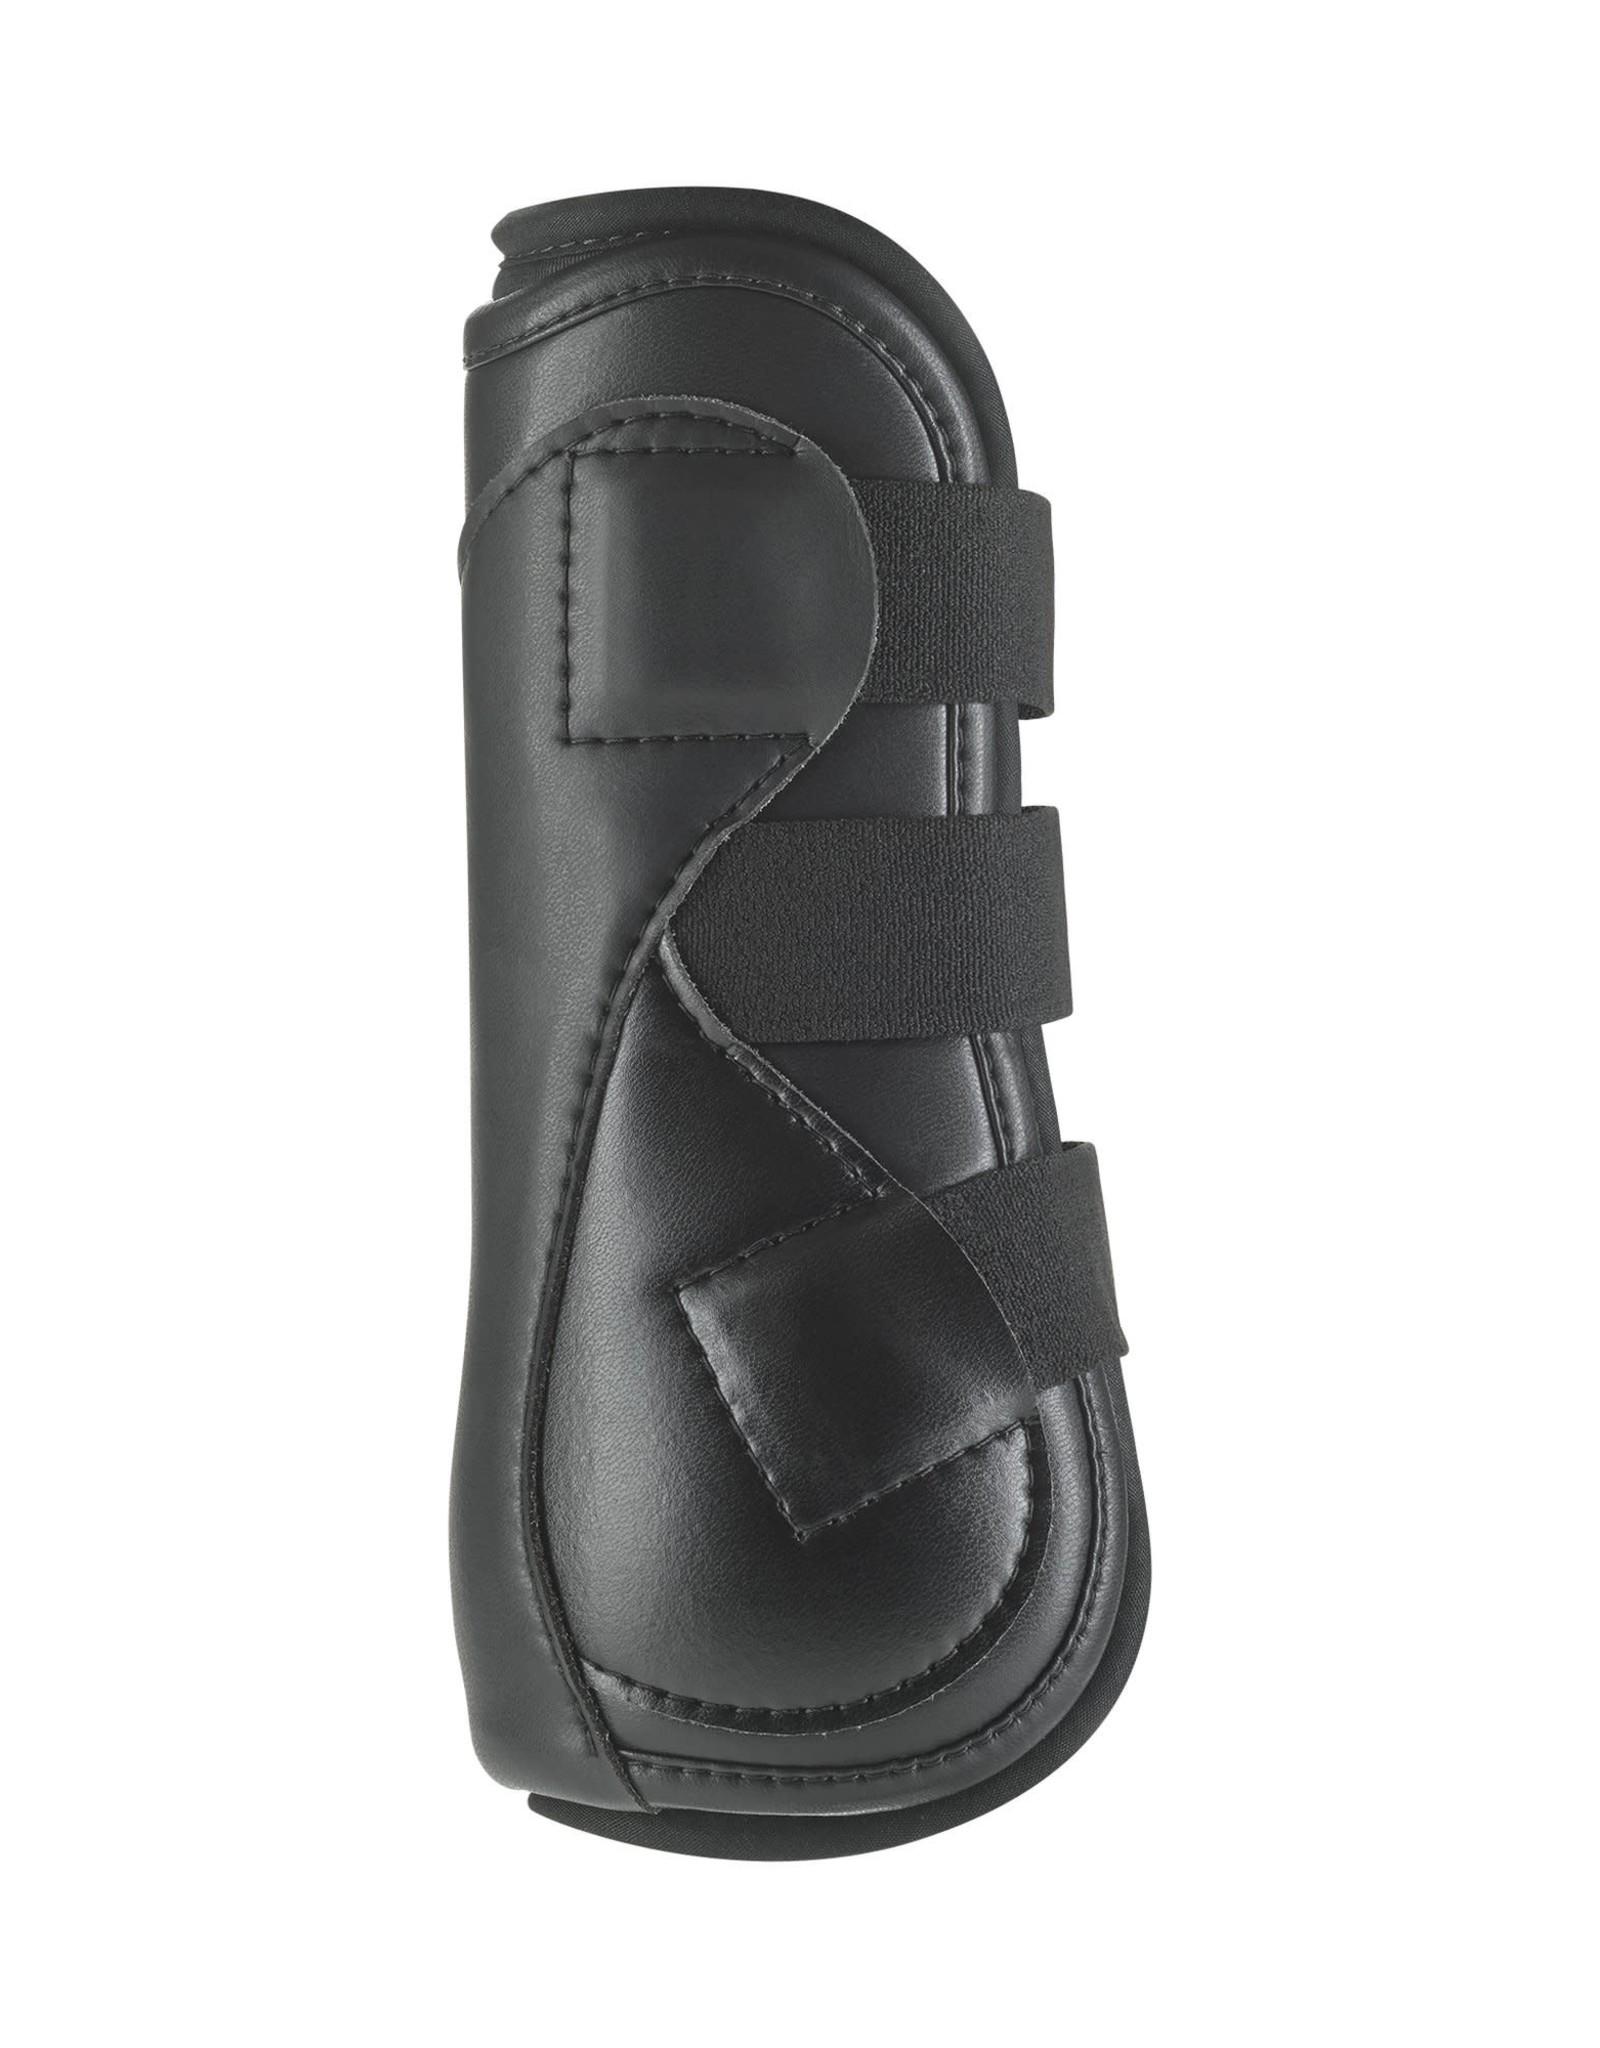 EQUIFIT EQ-TEQ™ FRONT BOOT (IMPACTEQ)